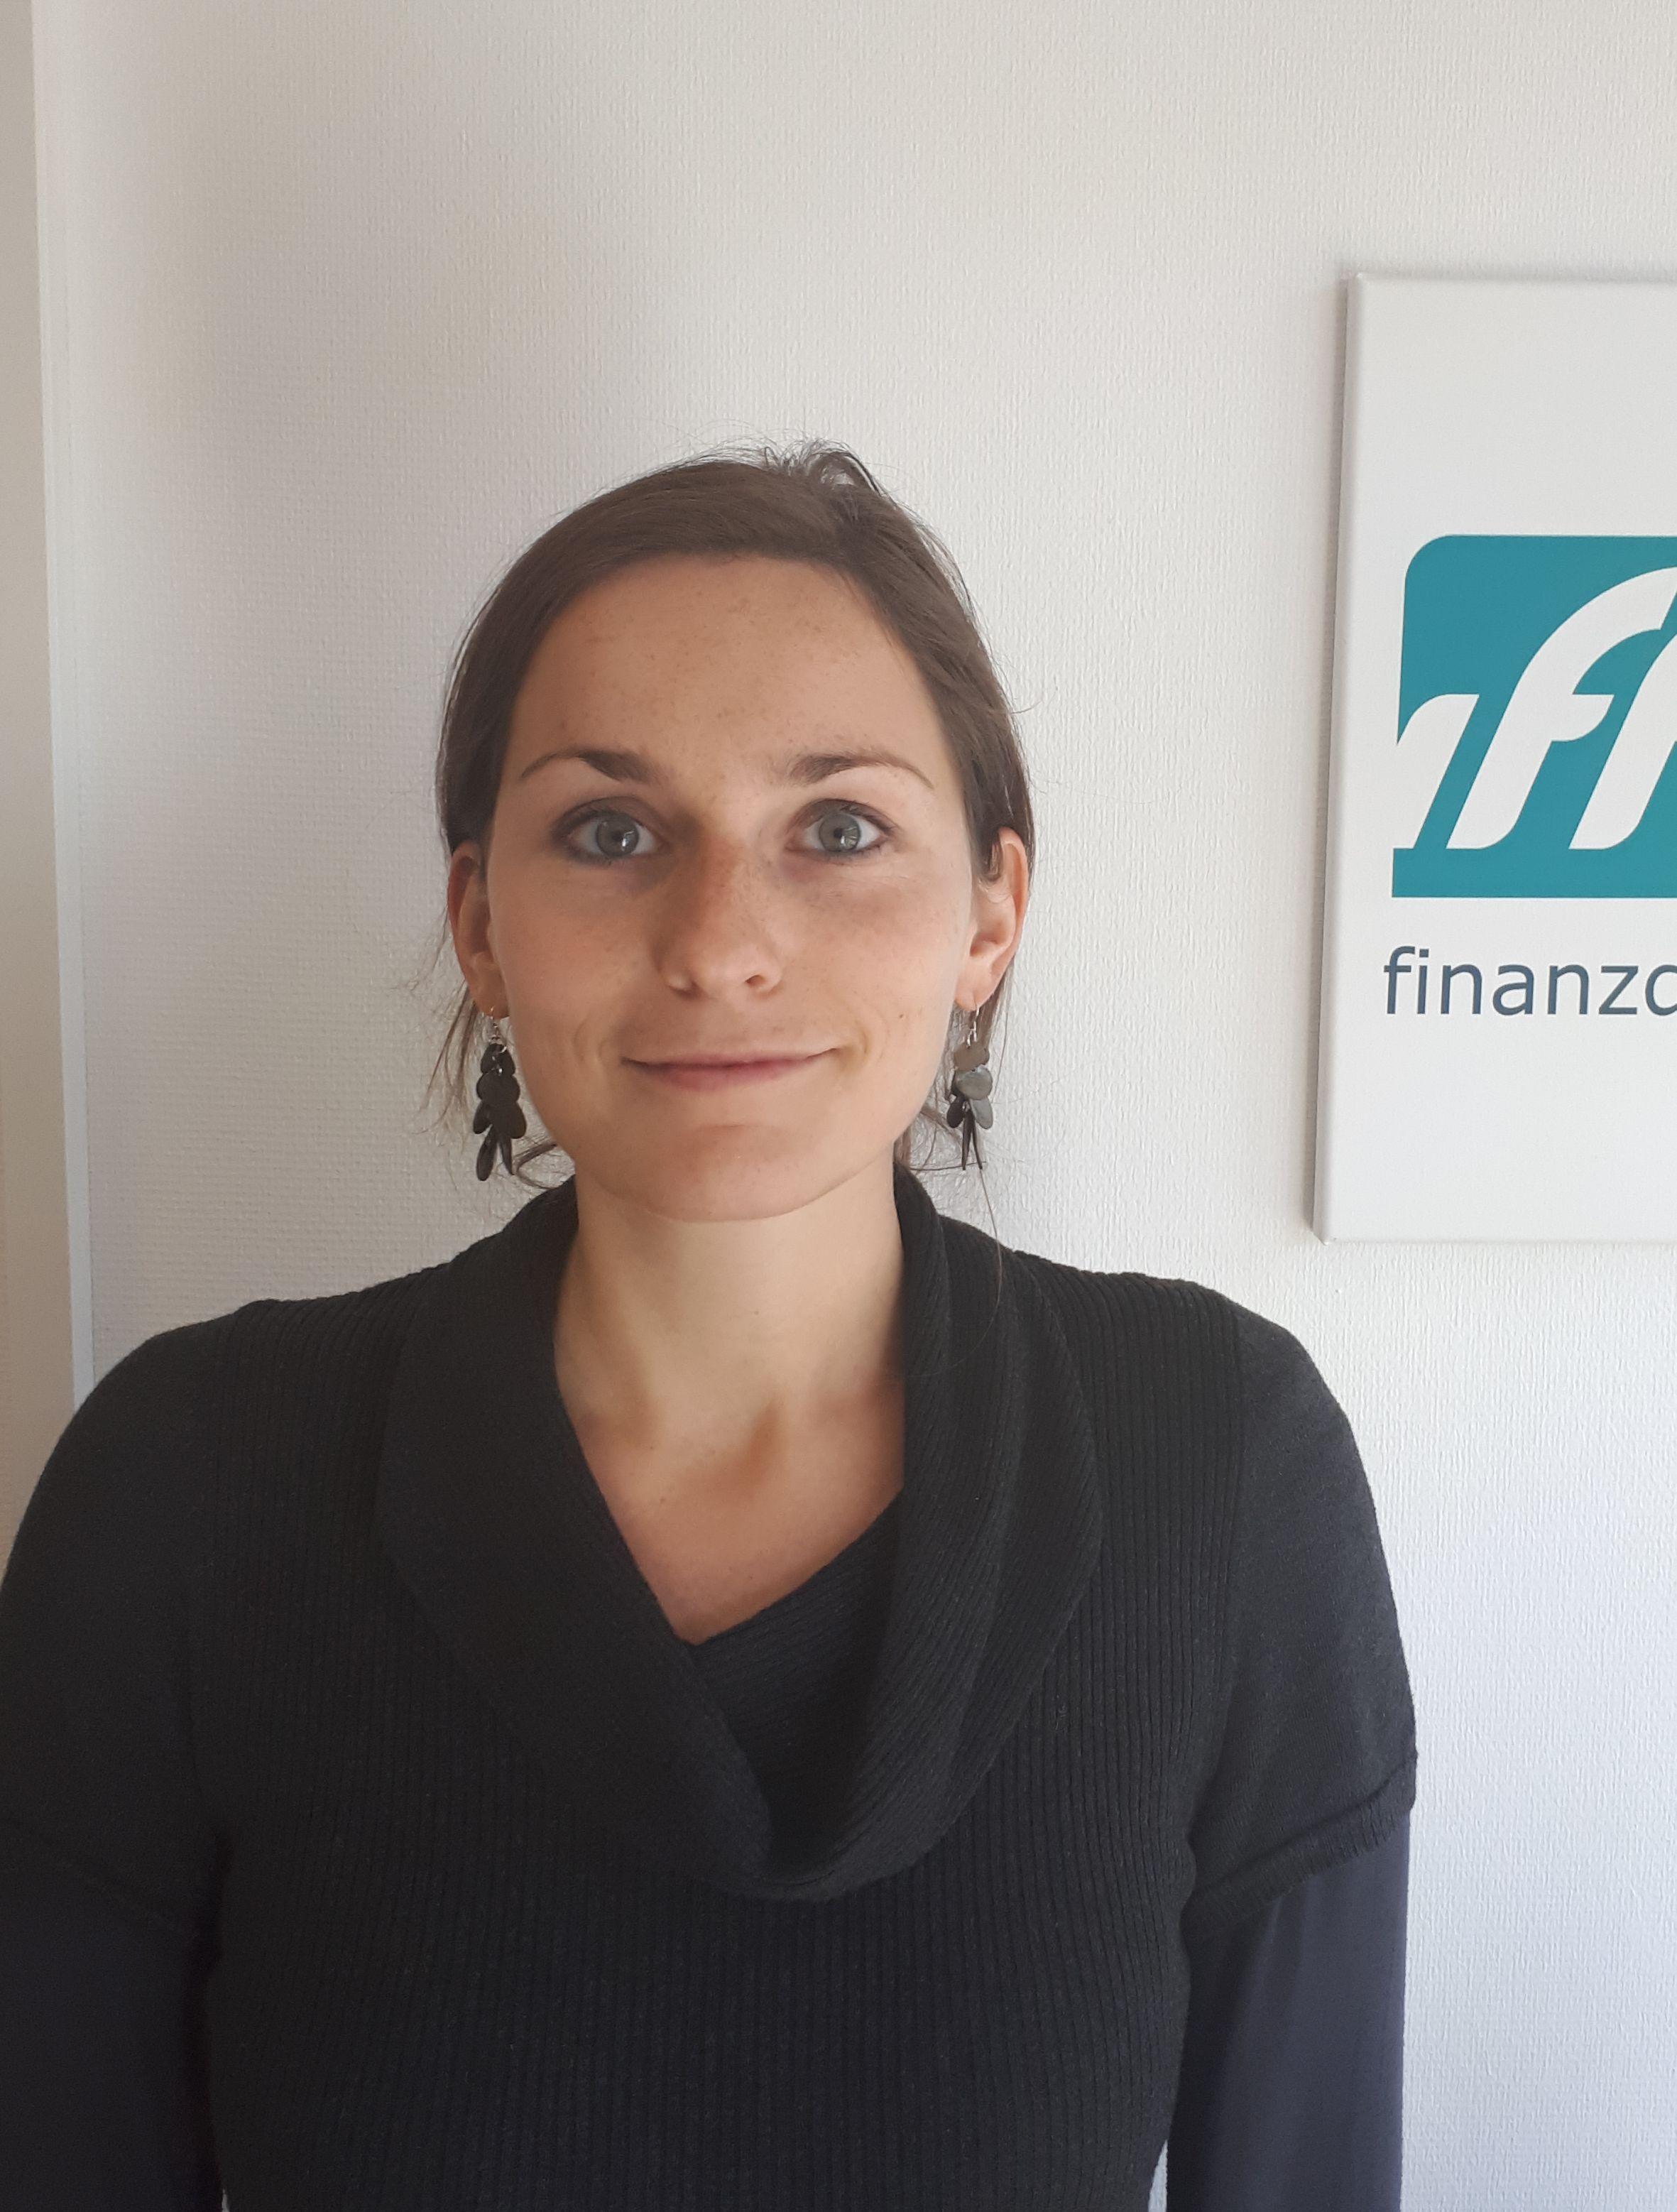 Ulrike Freistedt